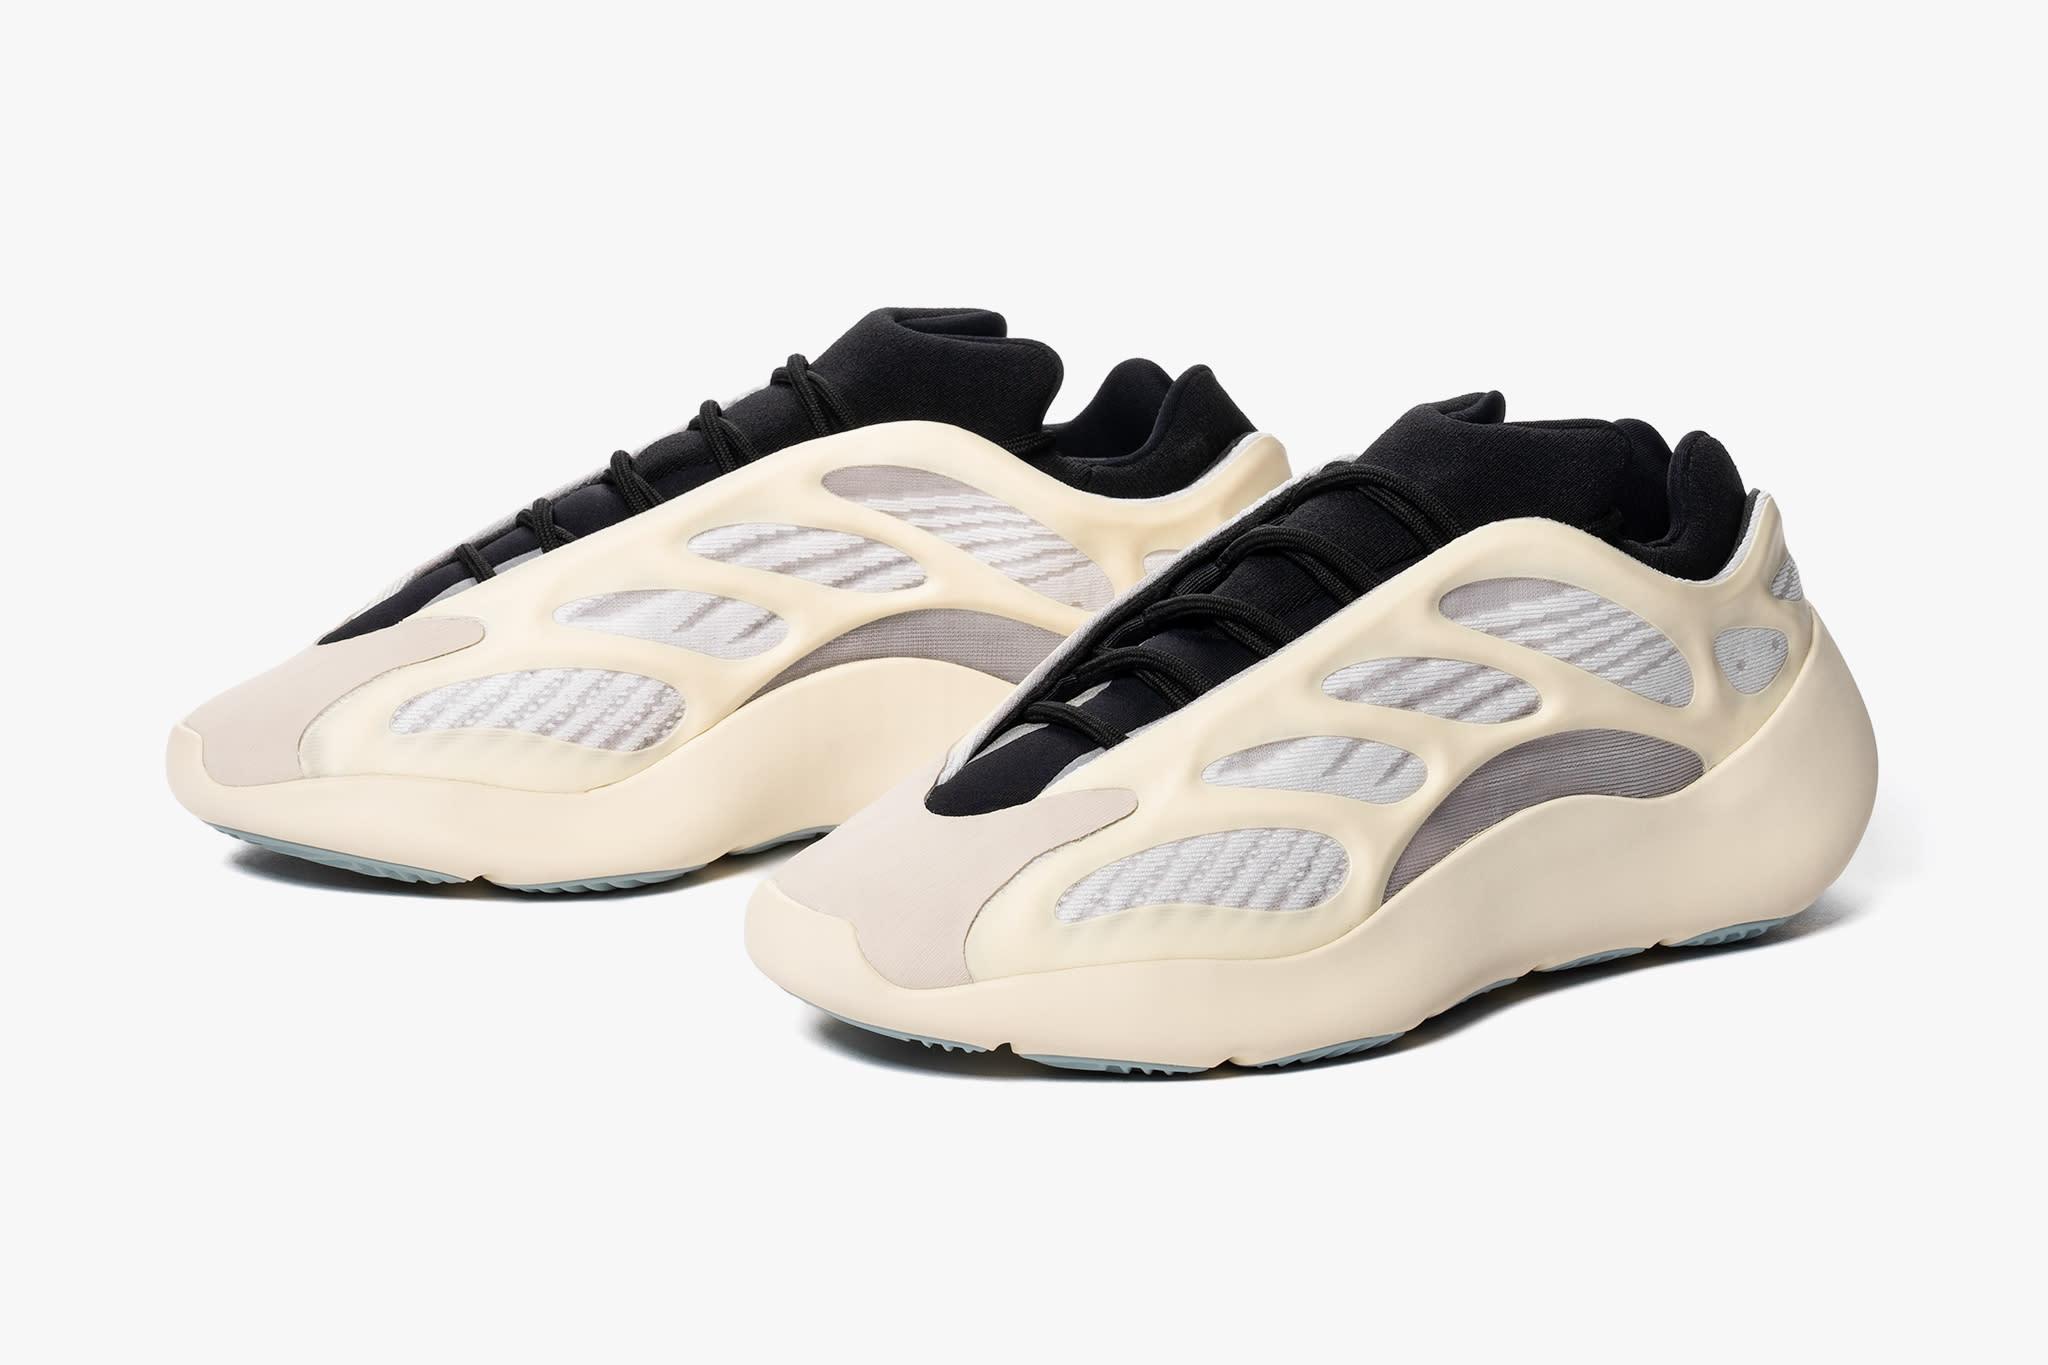 adidas Yeezy 700 V3 'Azael'   Release